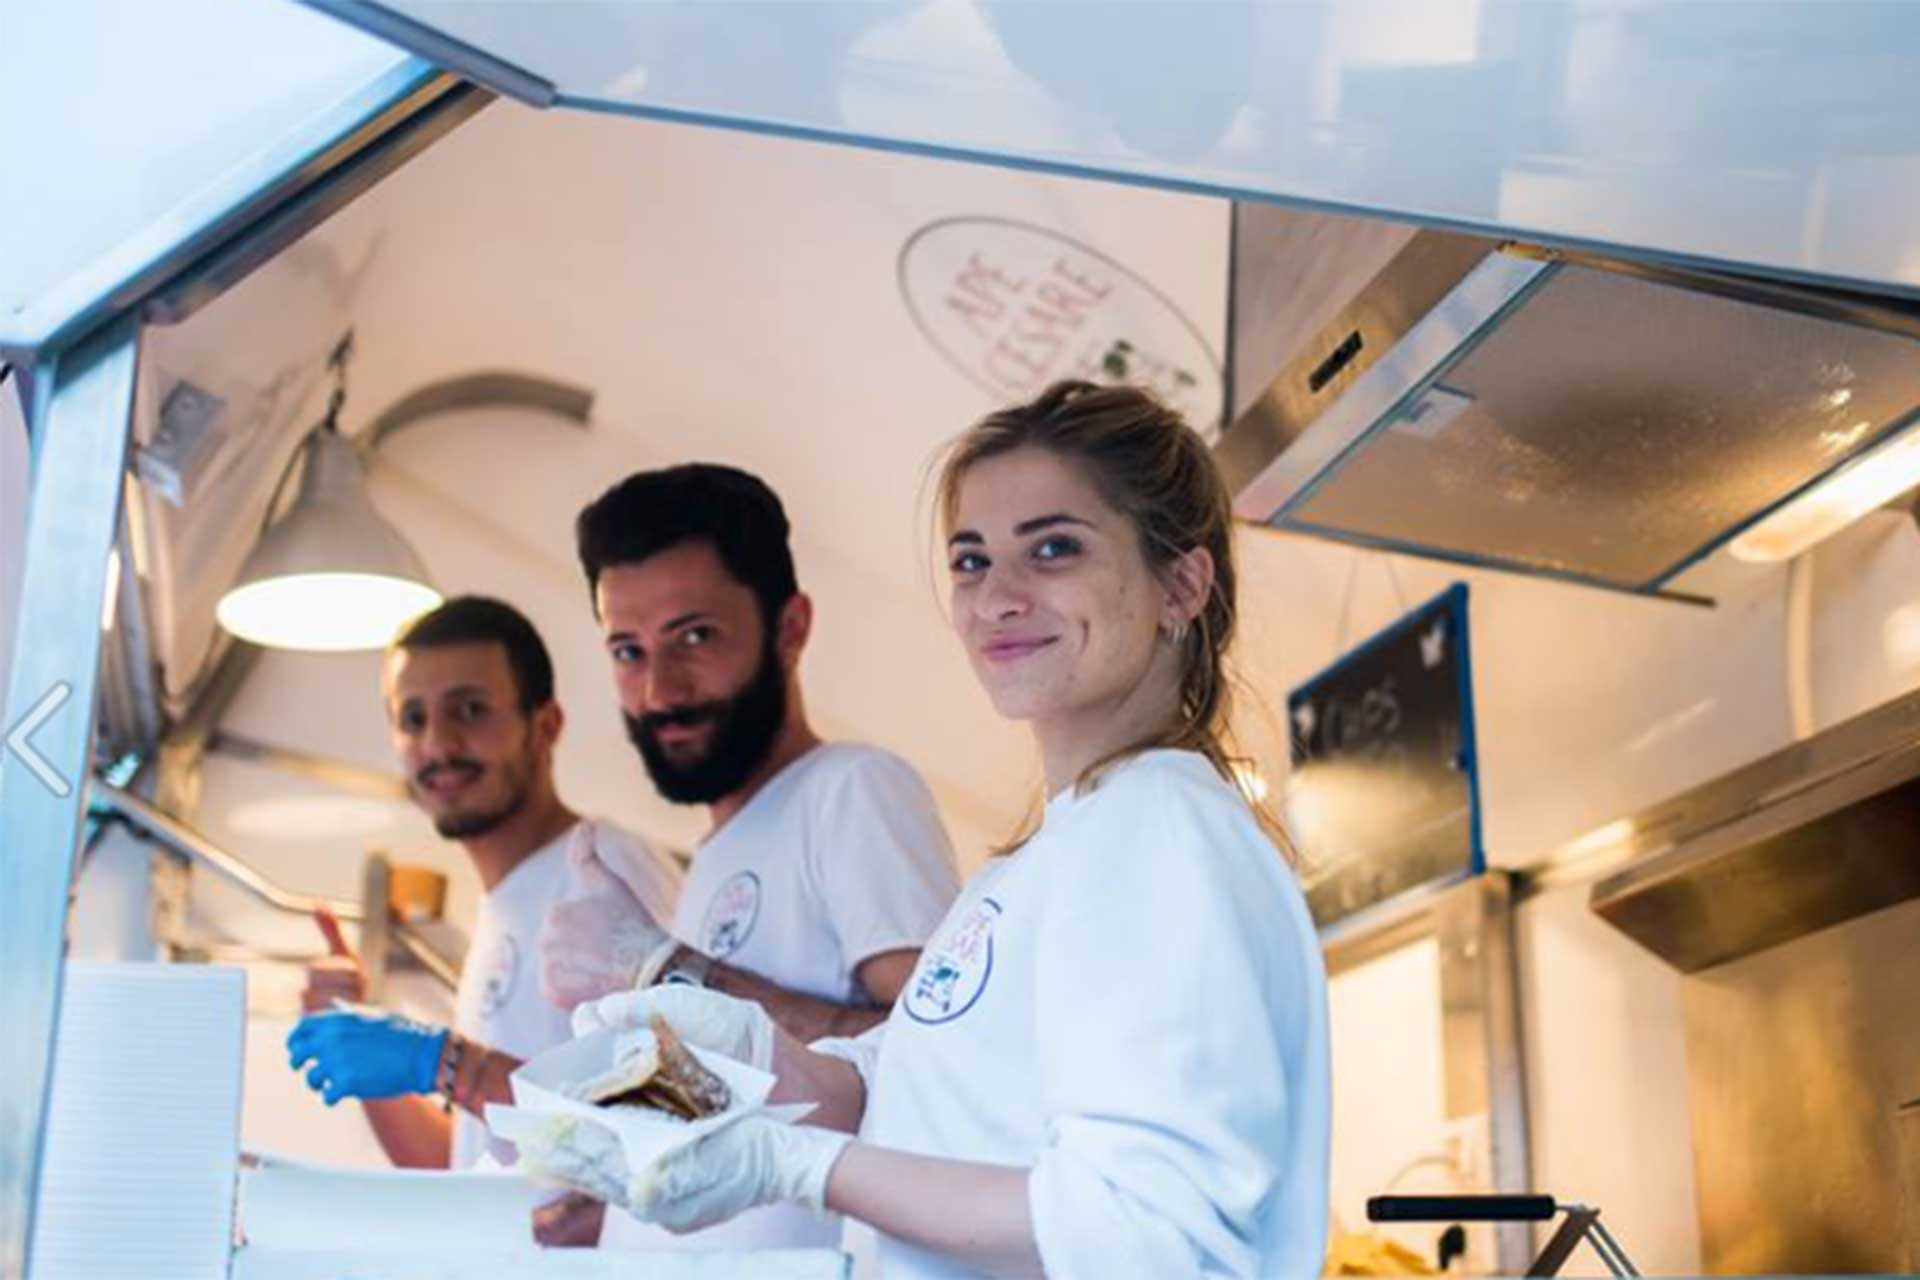 al lavoro sugli street food trucks